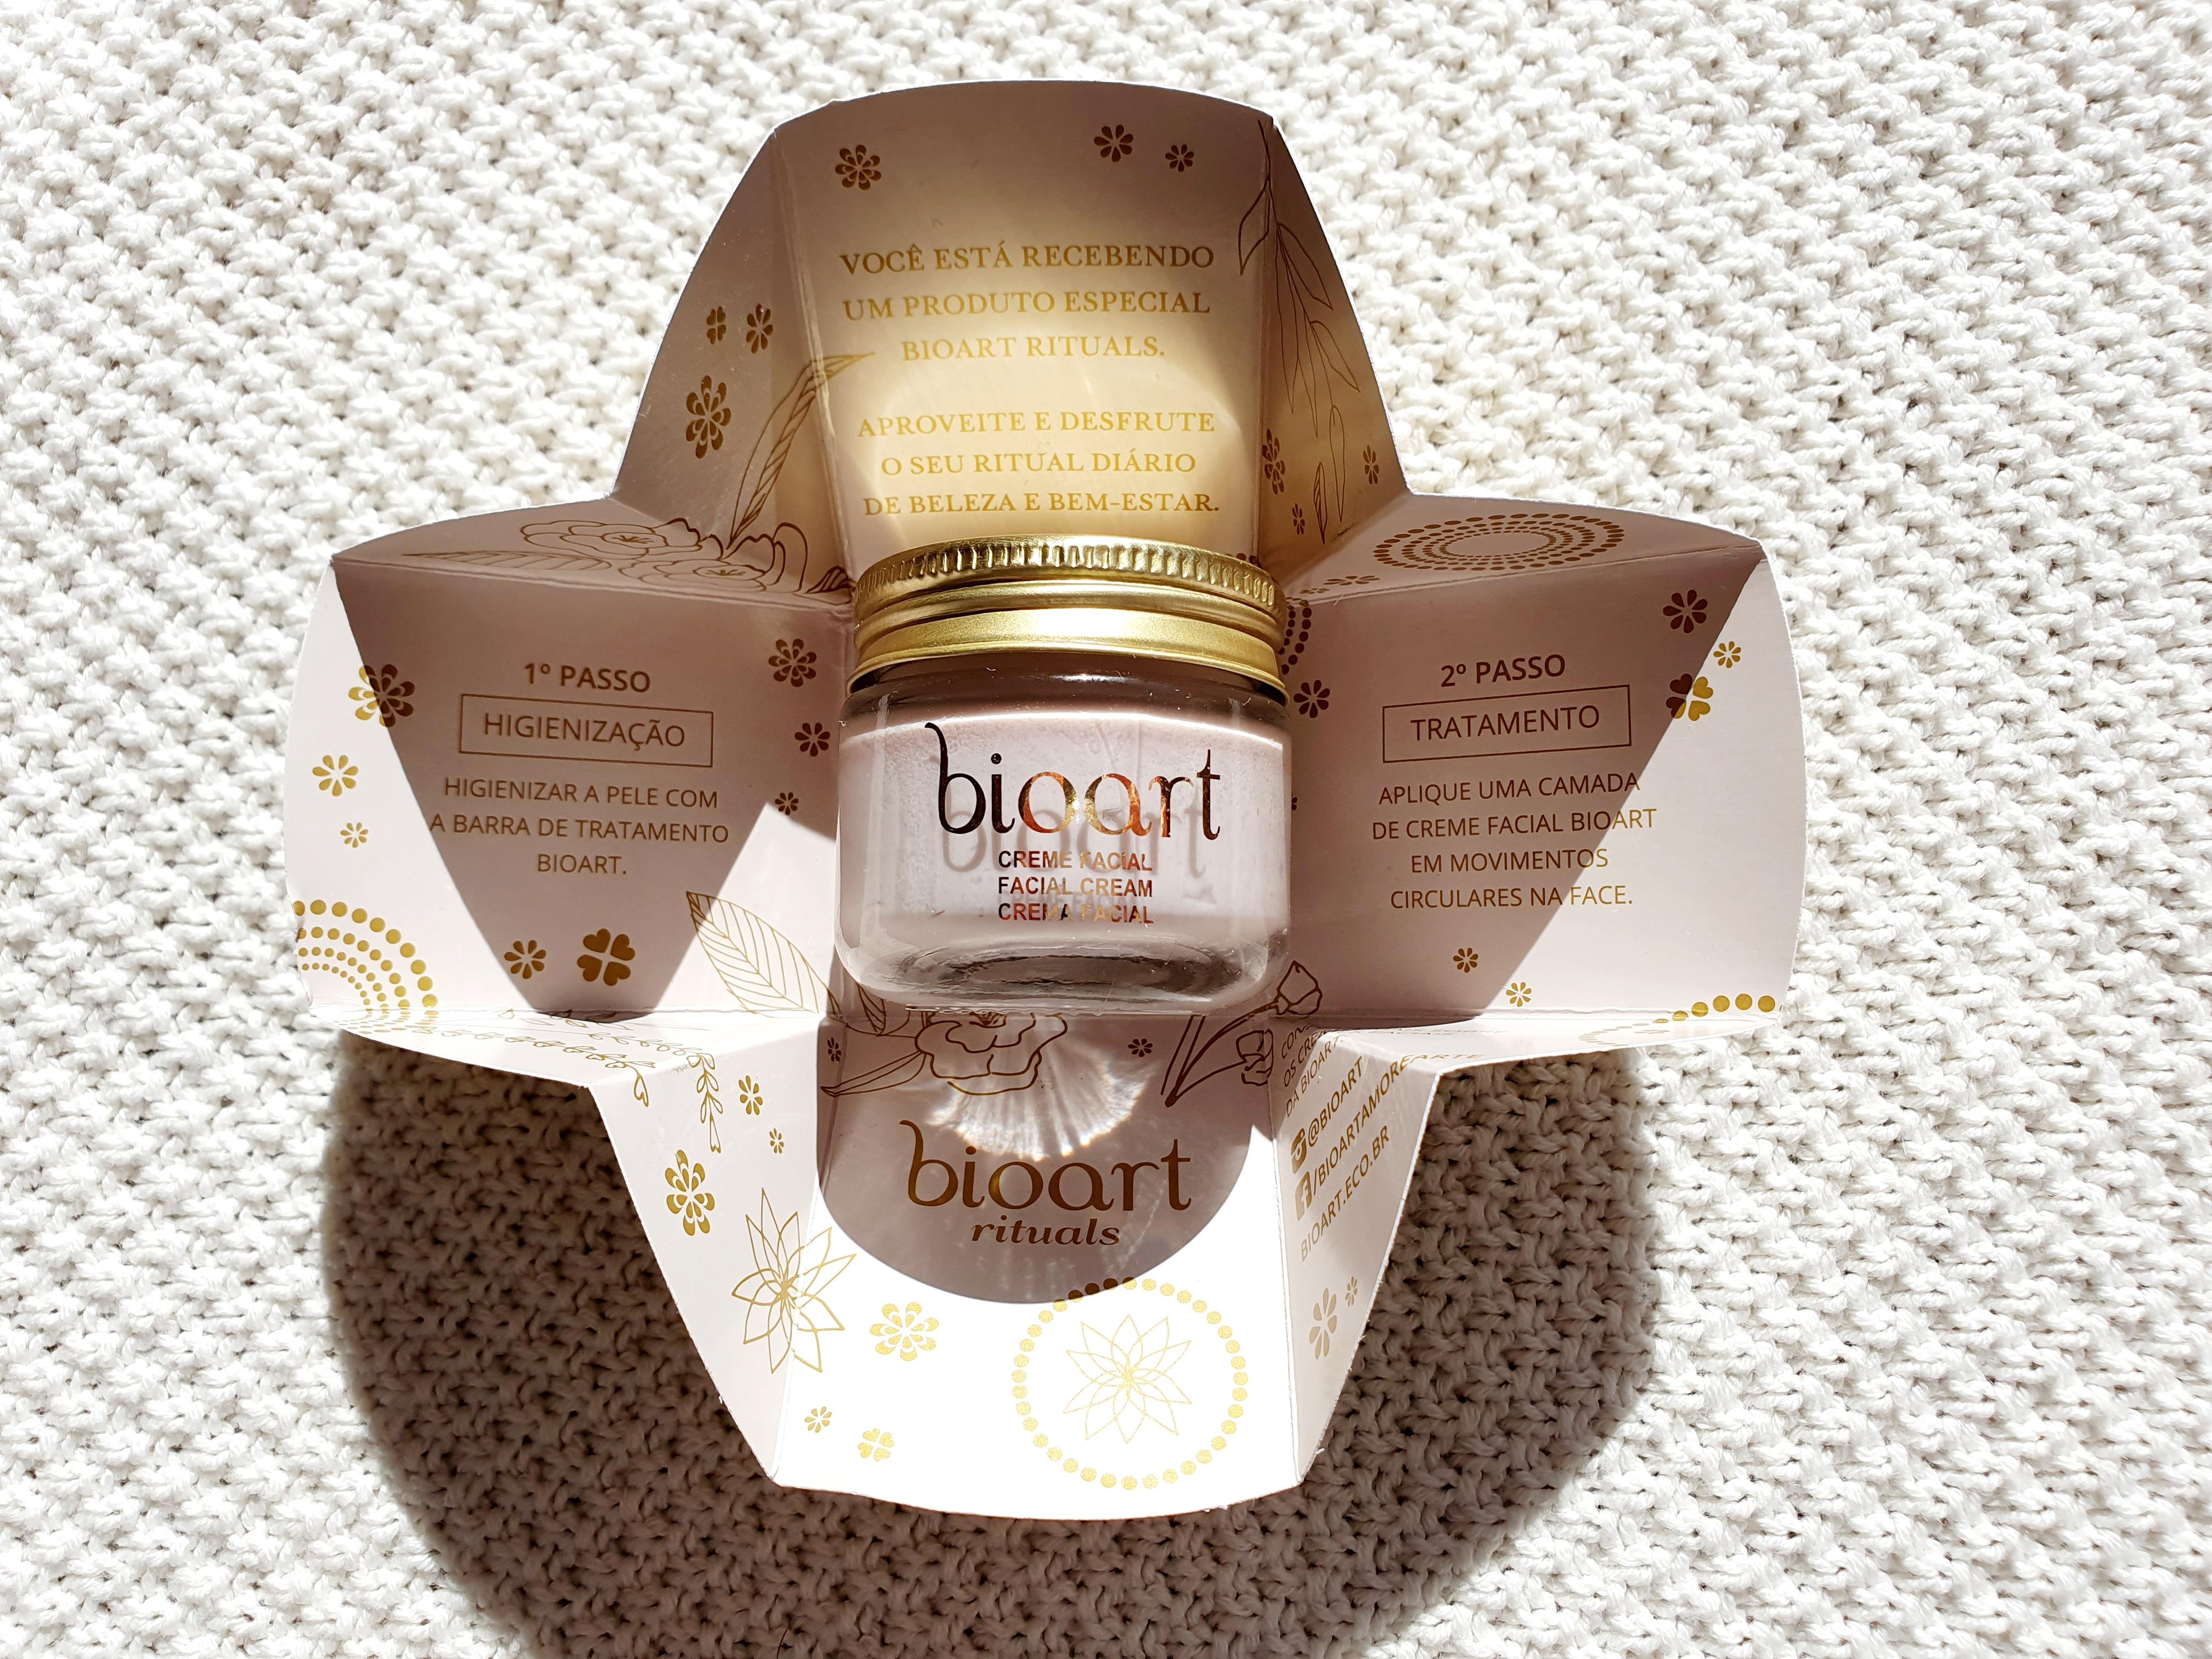 Bioart beauty products